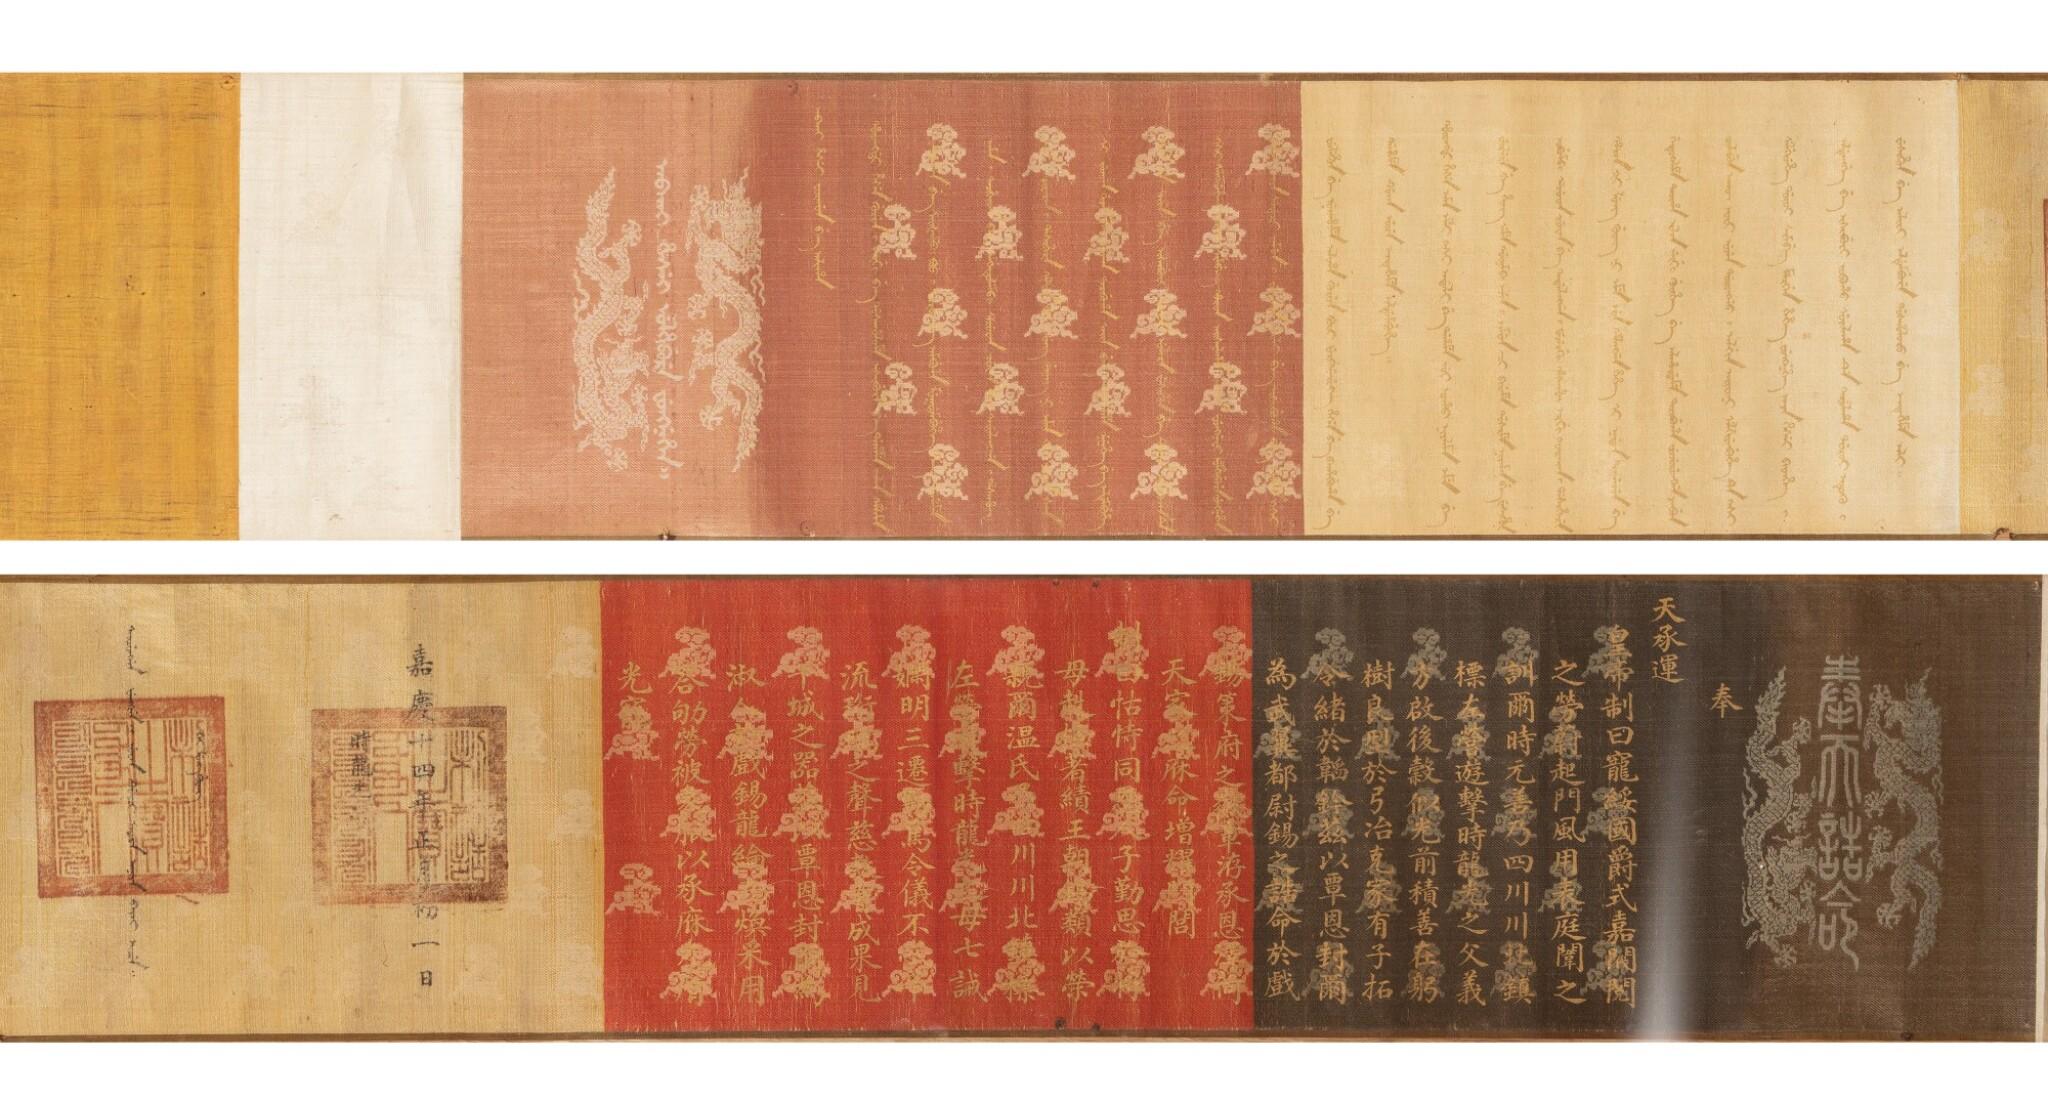 View full screen - View 1 of Lot 102. An Imperial edict Qing dynasty, Jiaqing period, dated 14th year of the Jiaqing reign (1809) | 清嘉慶 五色織錦誥命聖旨 「嘉慶十四年正月初一日」字 「制誥之寶」印.